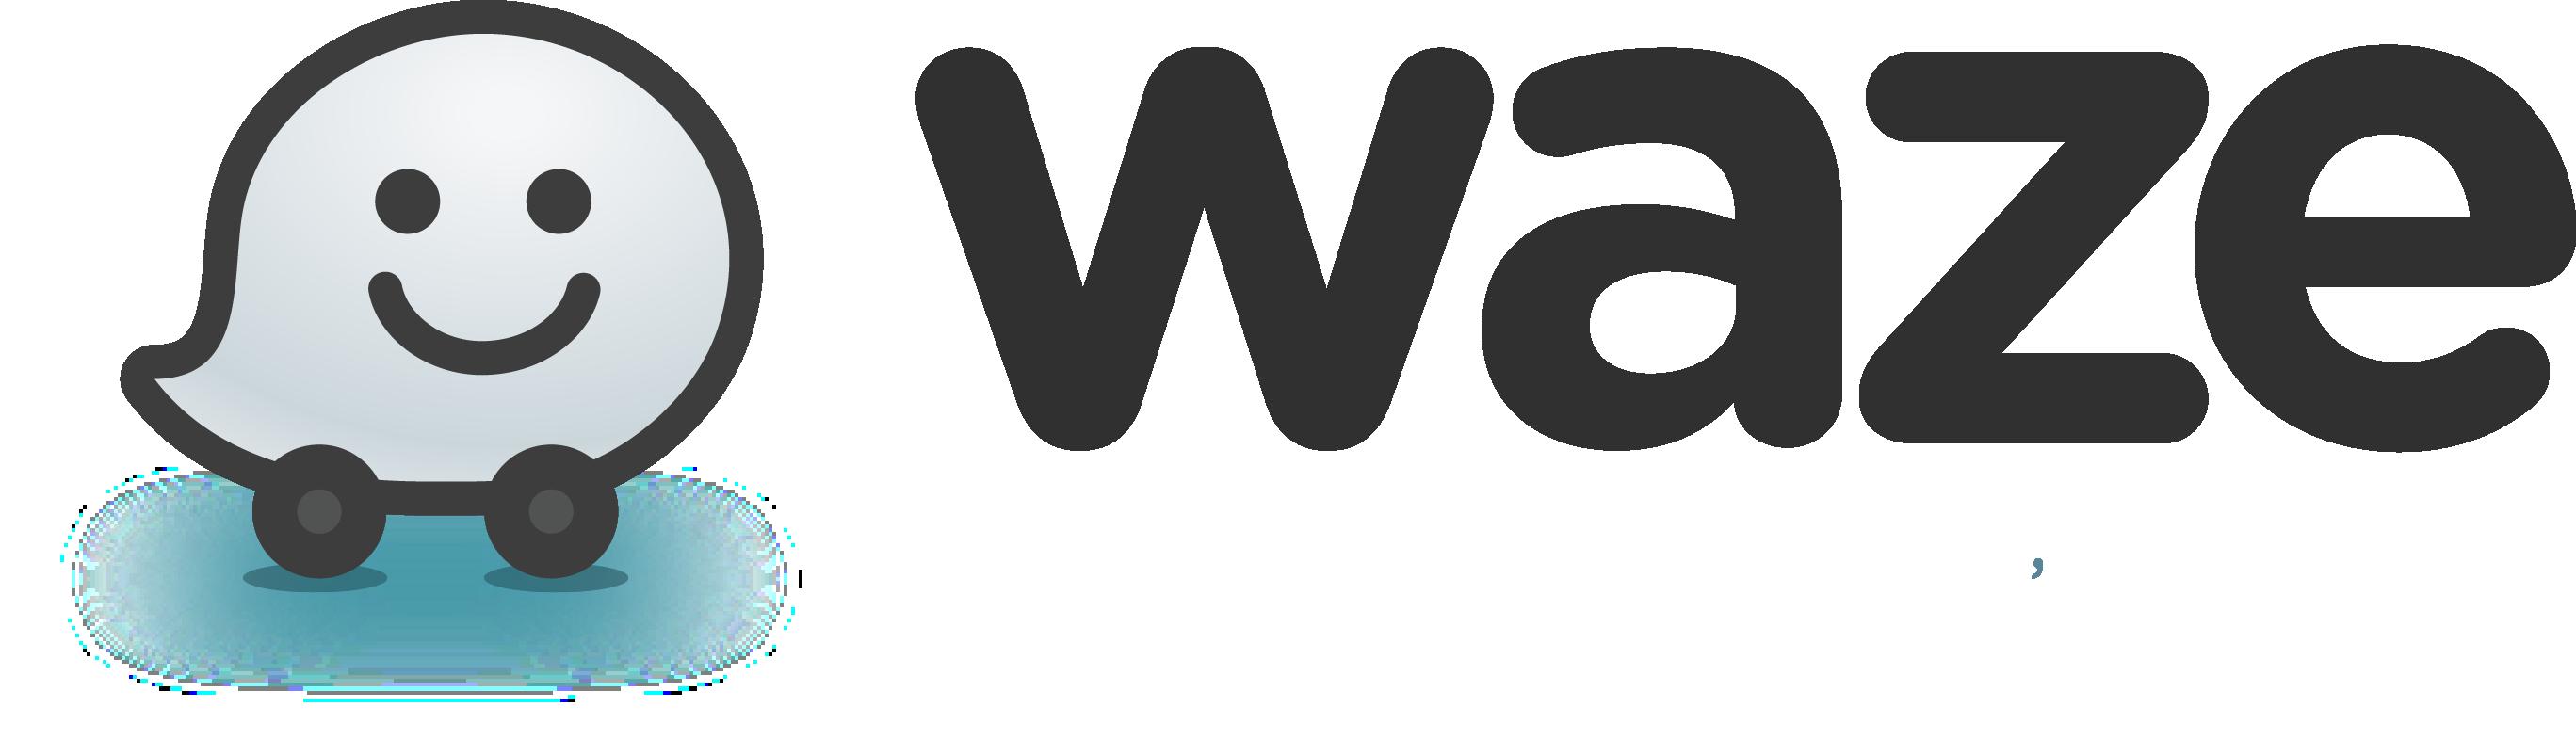 waze-logo wazelogoicon waze_logo wazelogo - Waze Logo Vector PNG